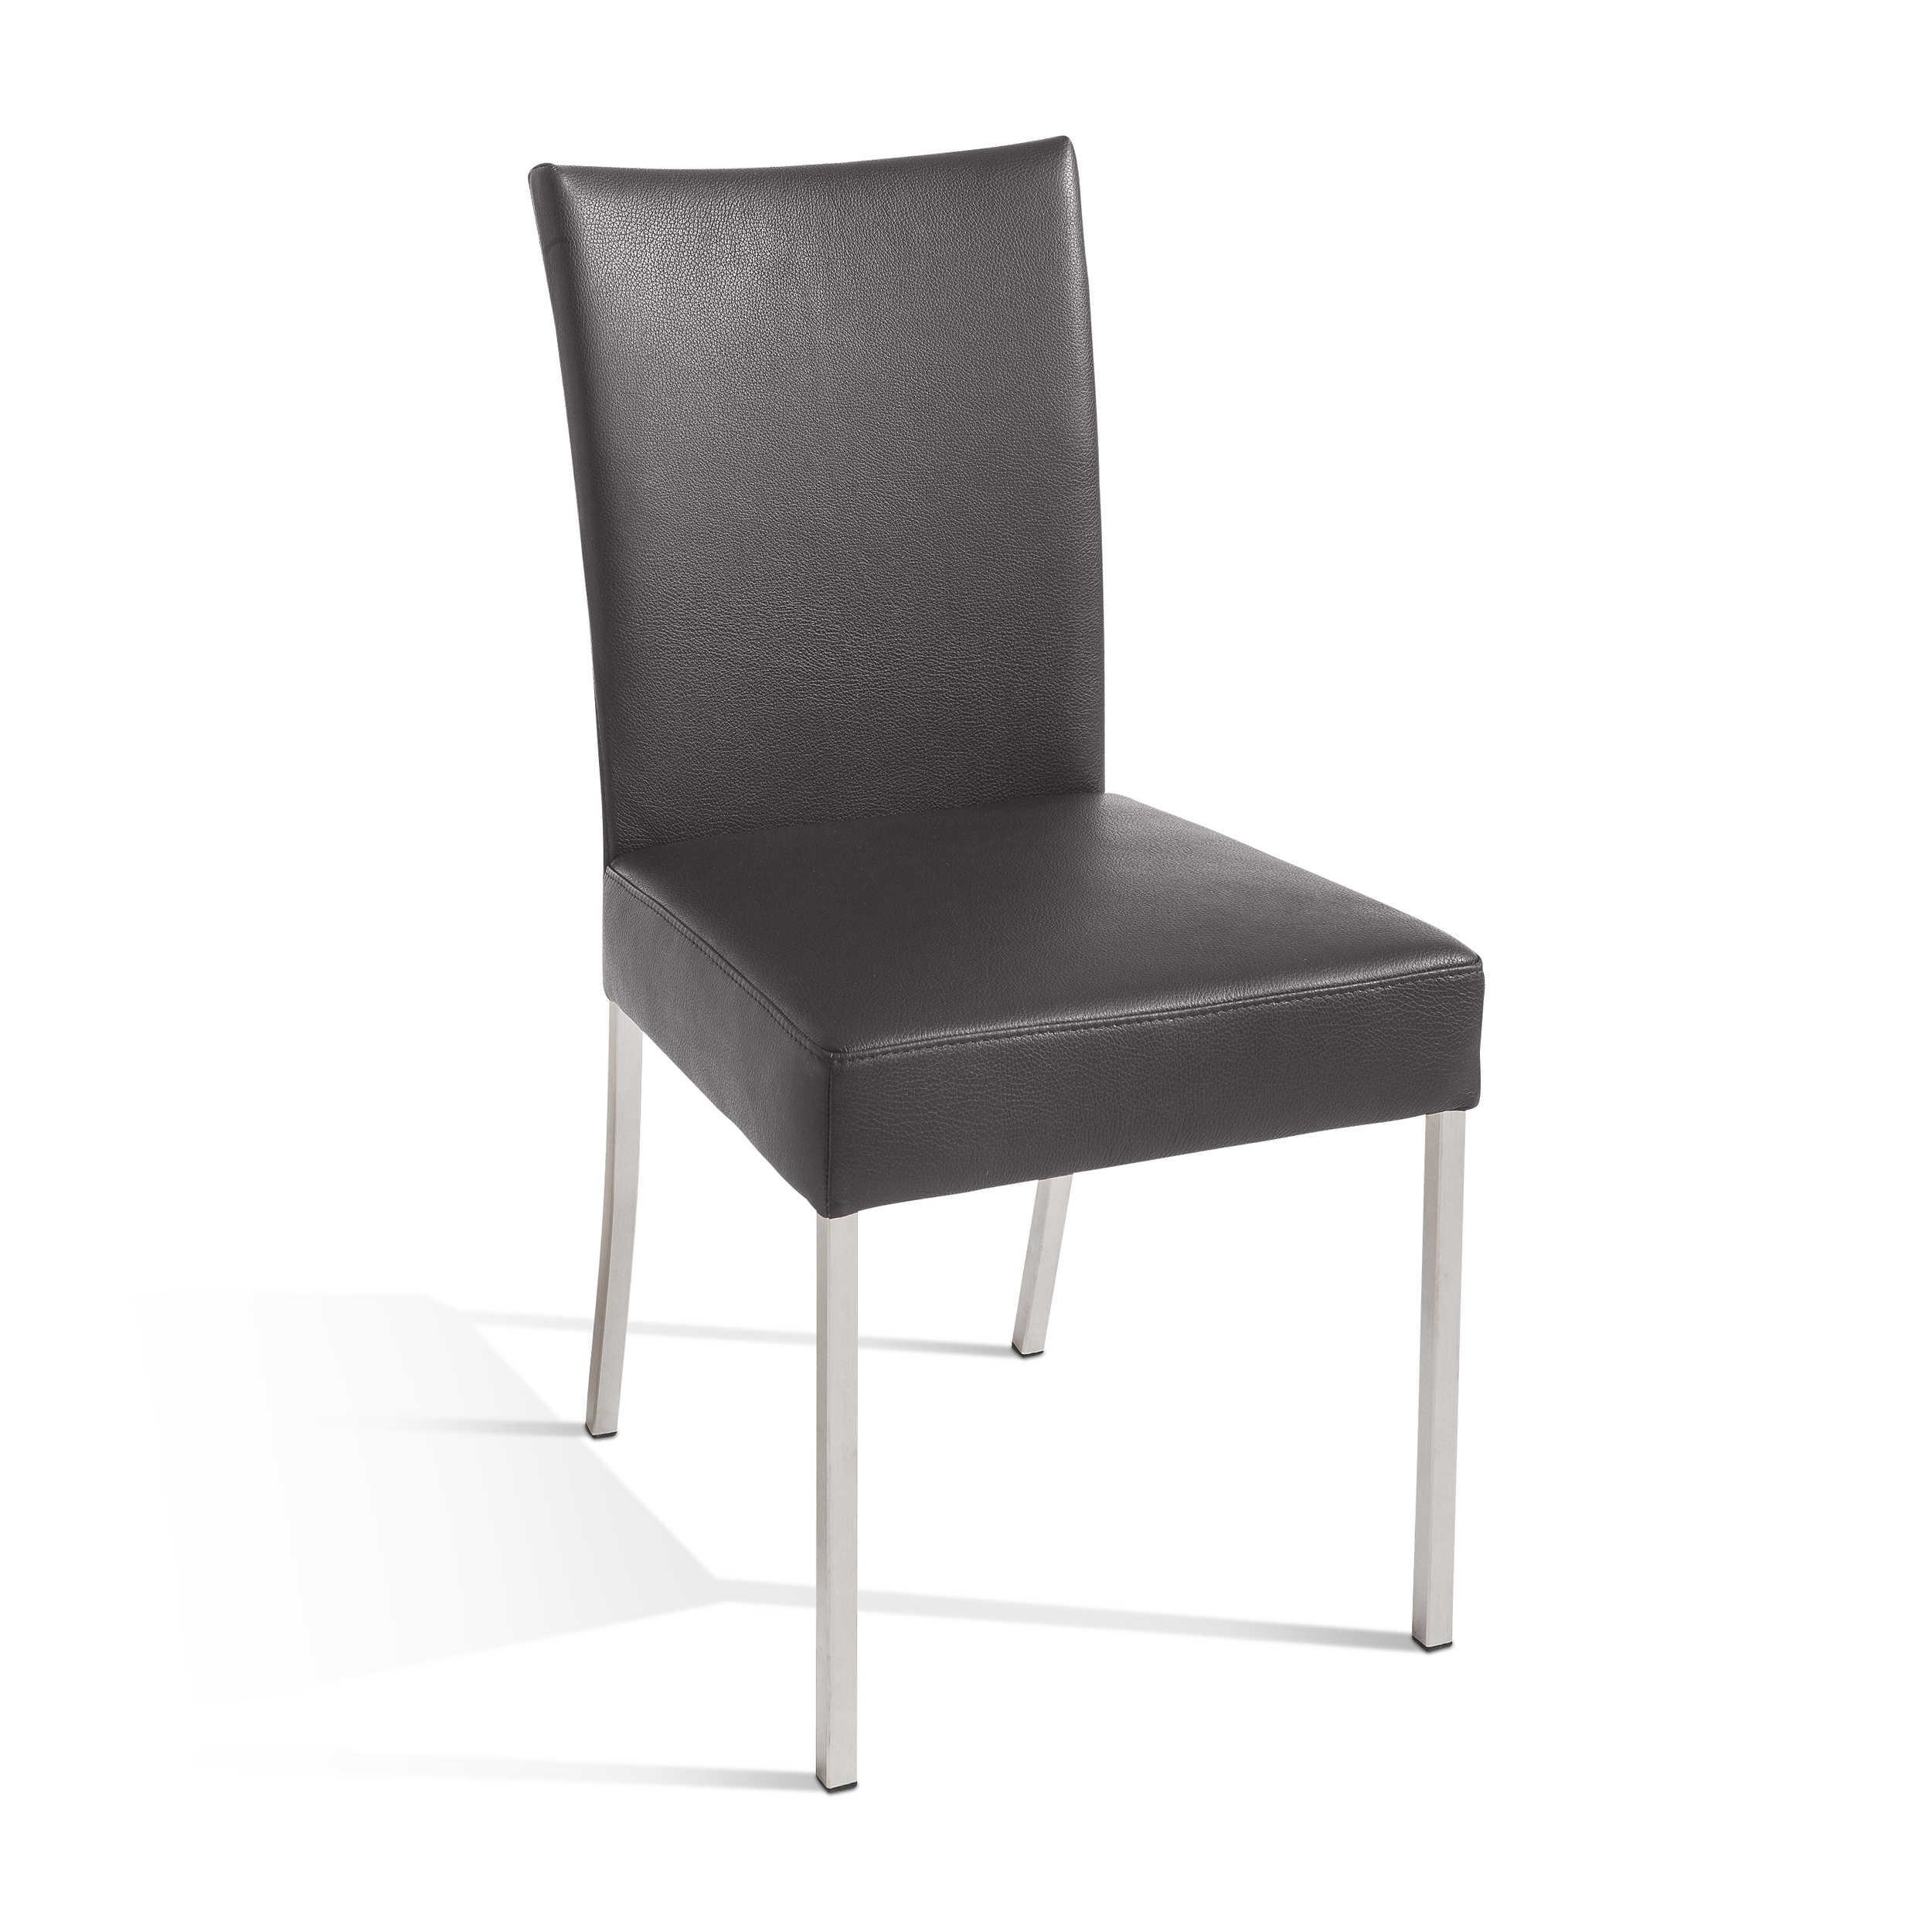 bert plantagie stuhl james grau leder online kaufen bei woonio. Black Bedroom Furniture Sets. Home Design Ideas